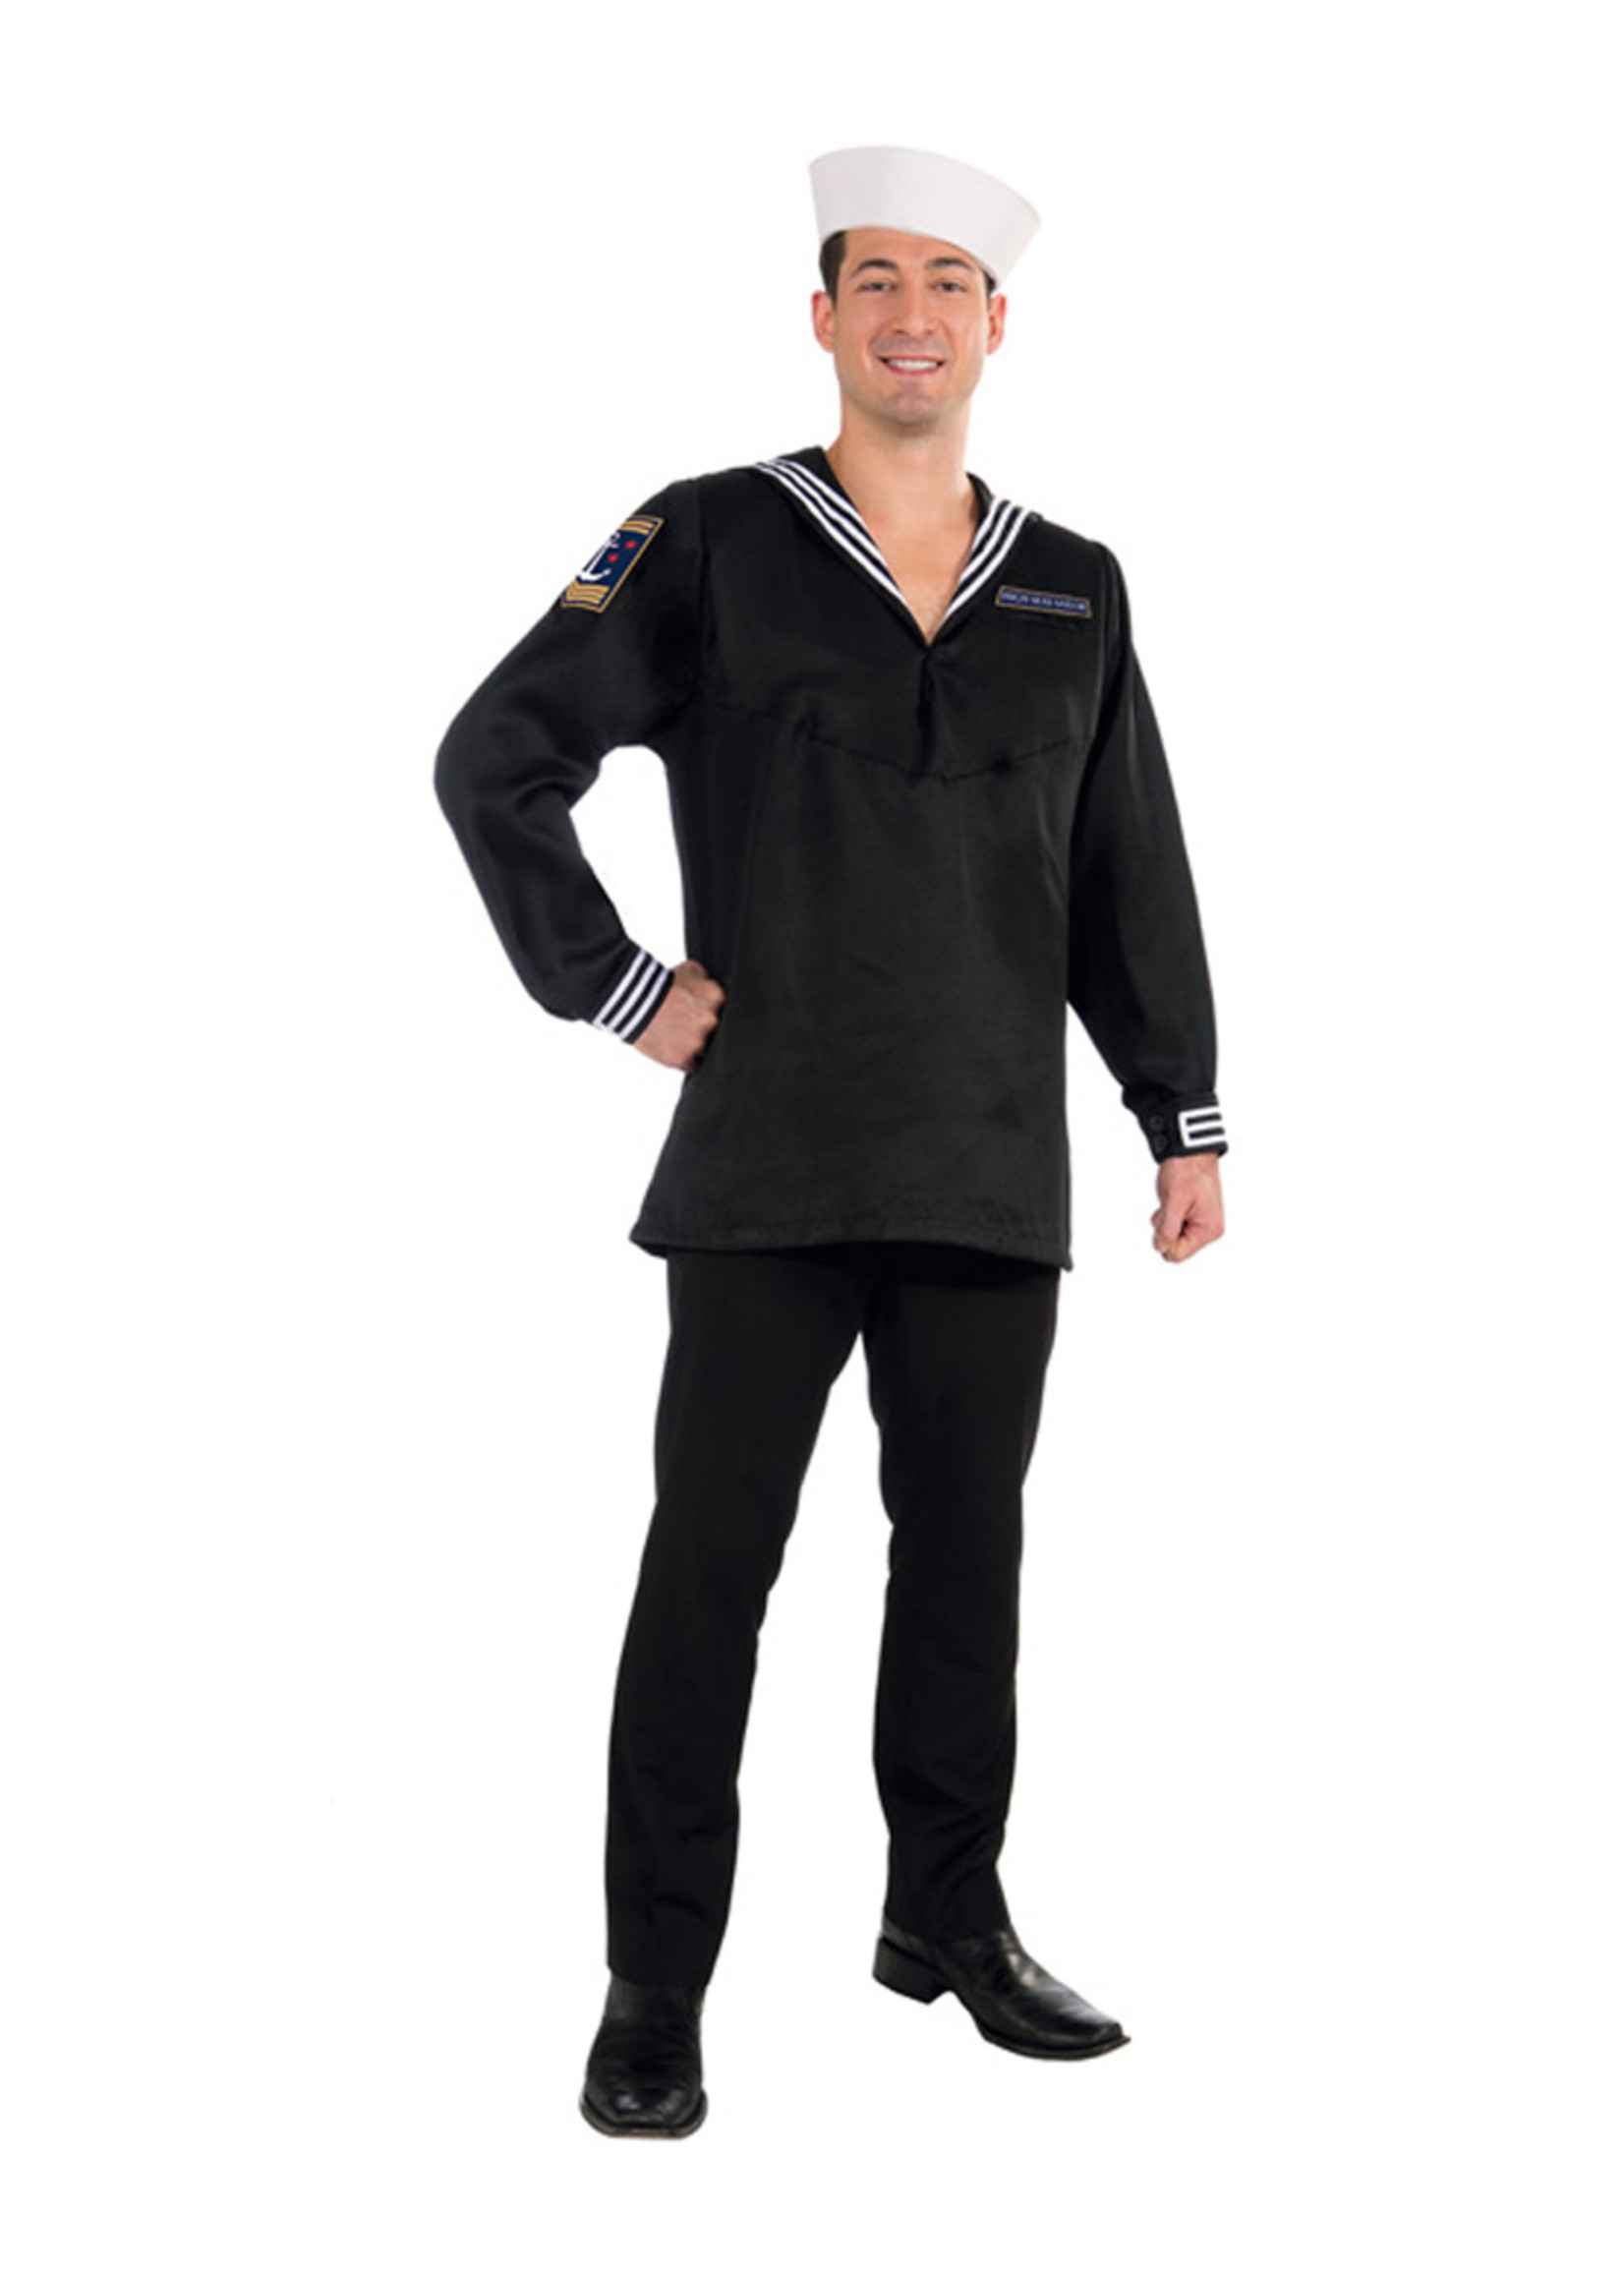 High Seas Sailor Costume - Men's